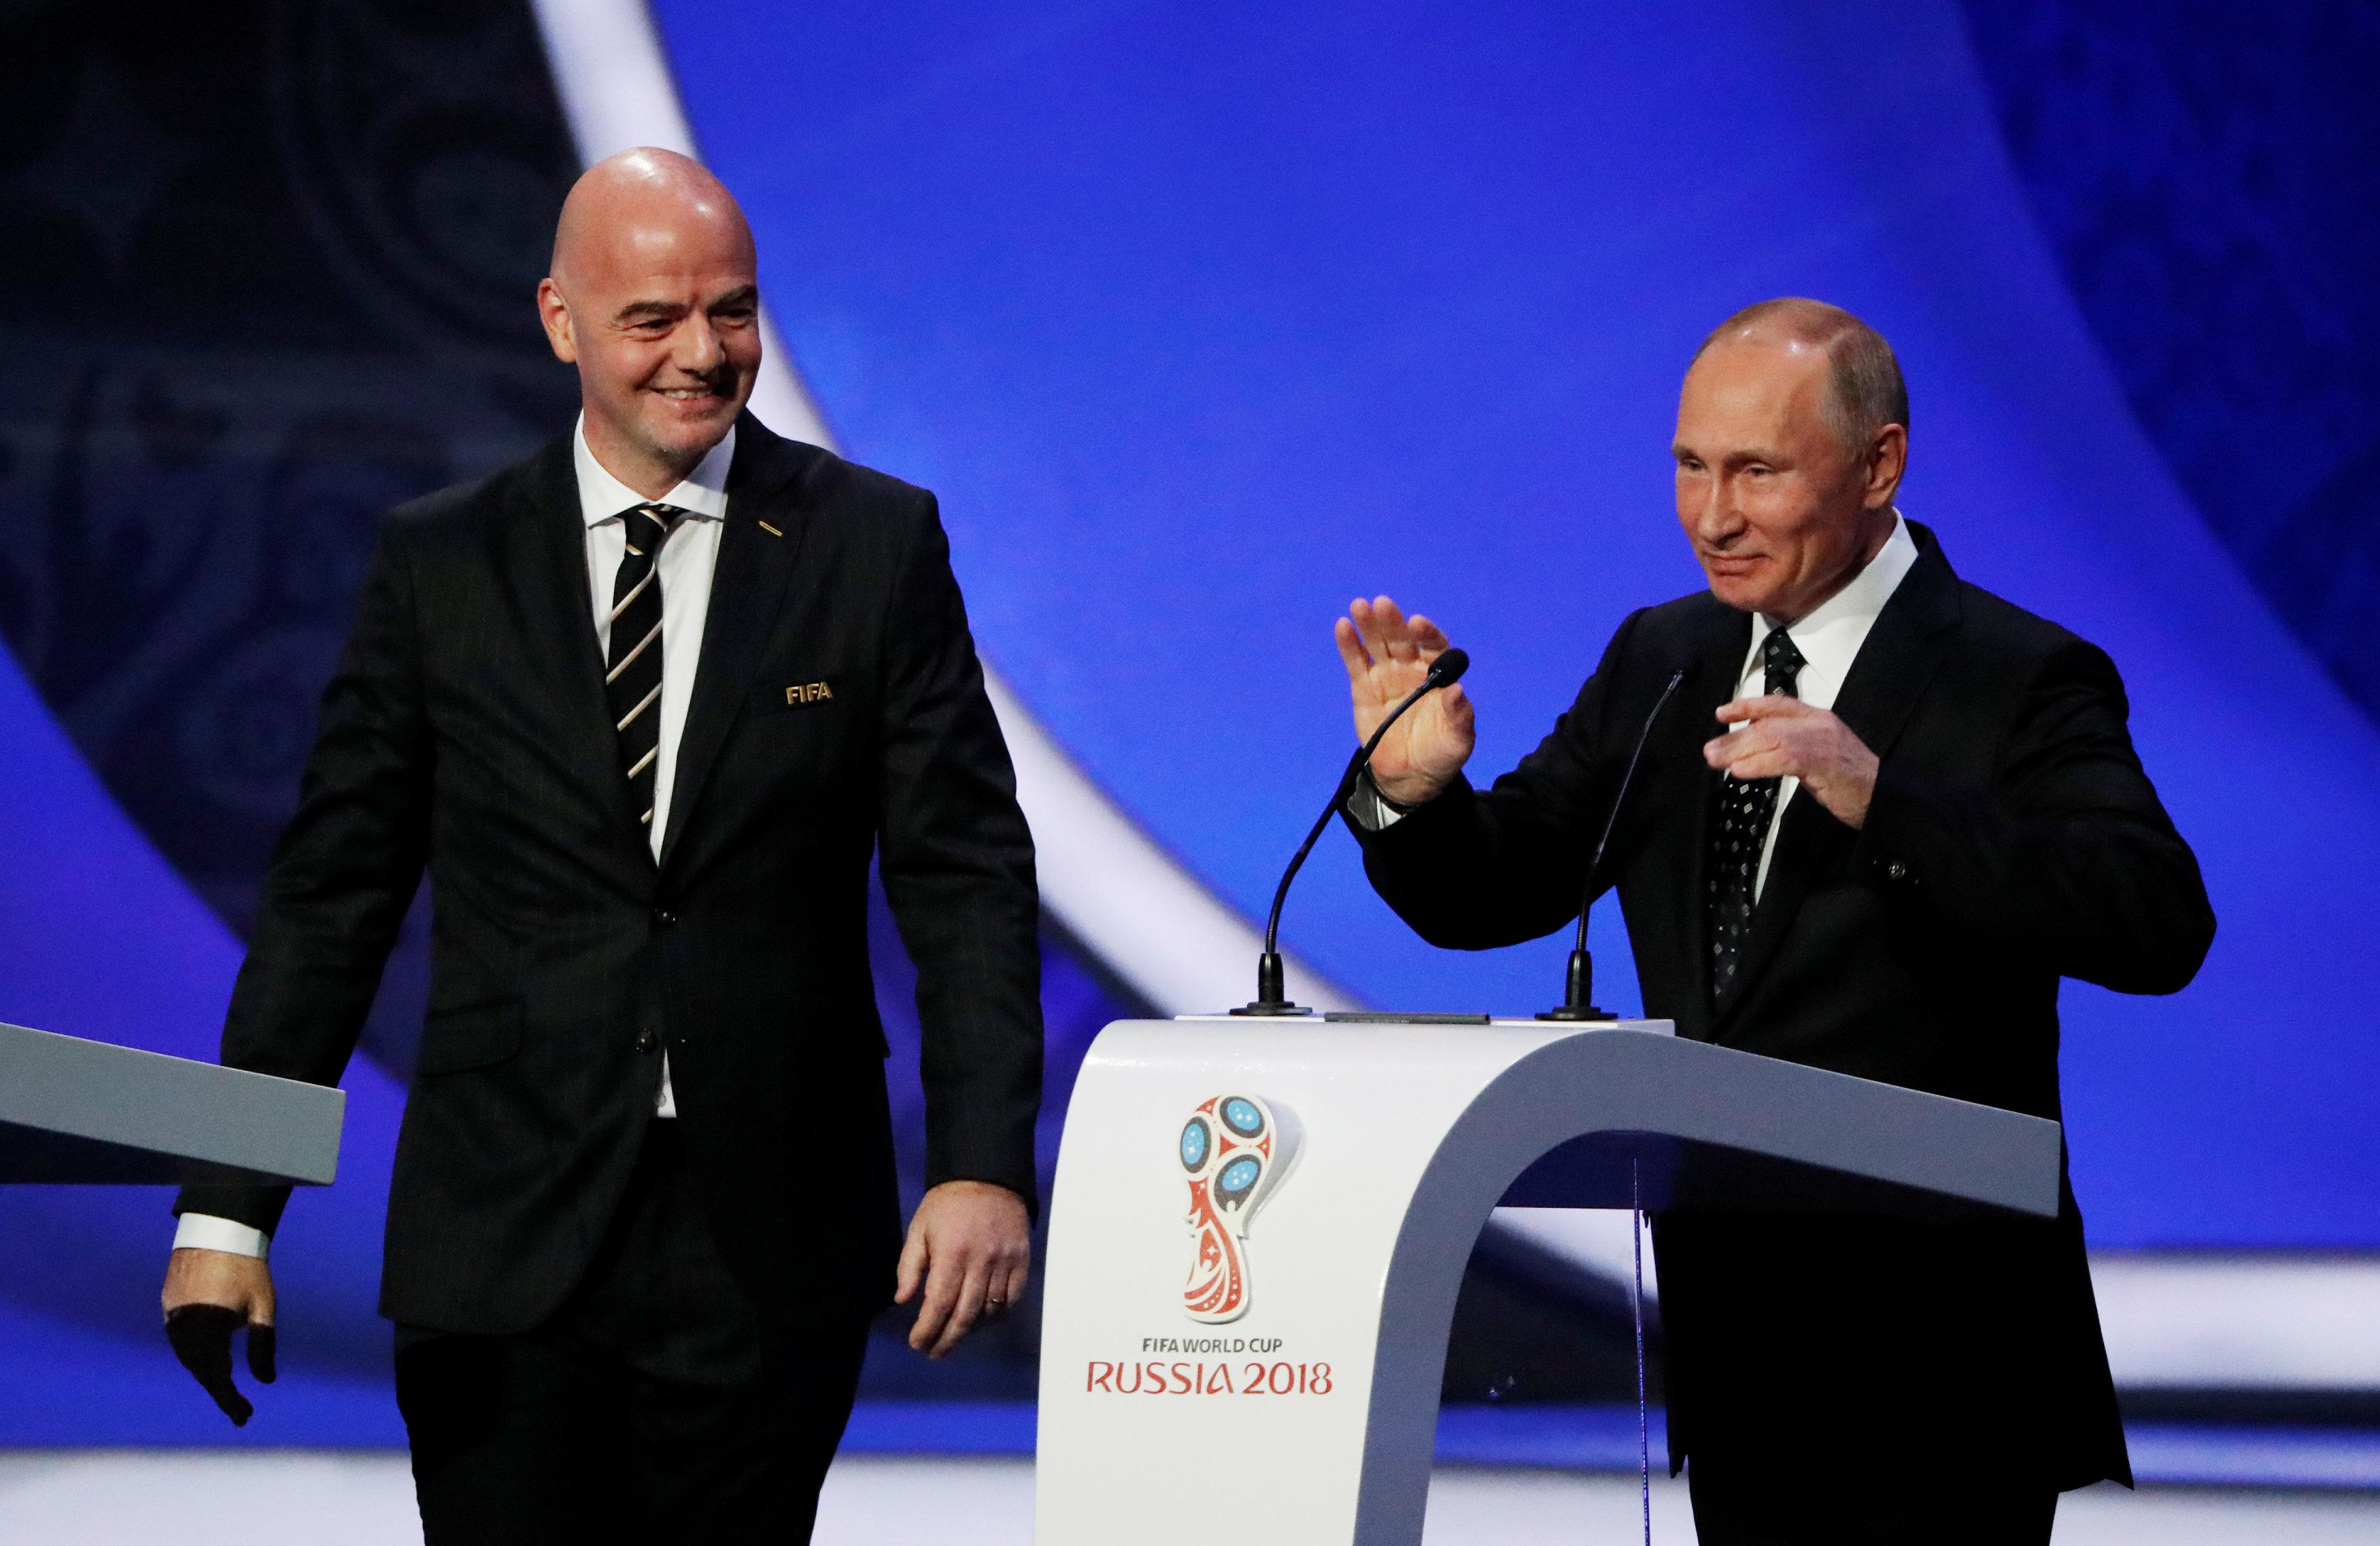 A moscou la f te n a pas eu lieu russie 2018 coupe du monde football - Lieu coupe du monde 2018 ...